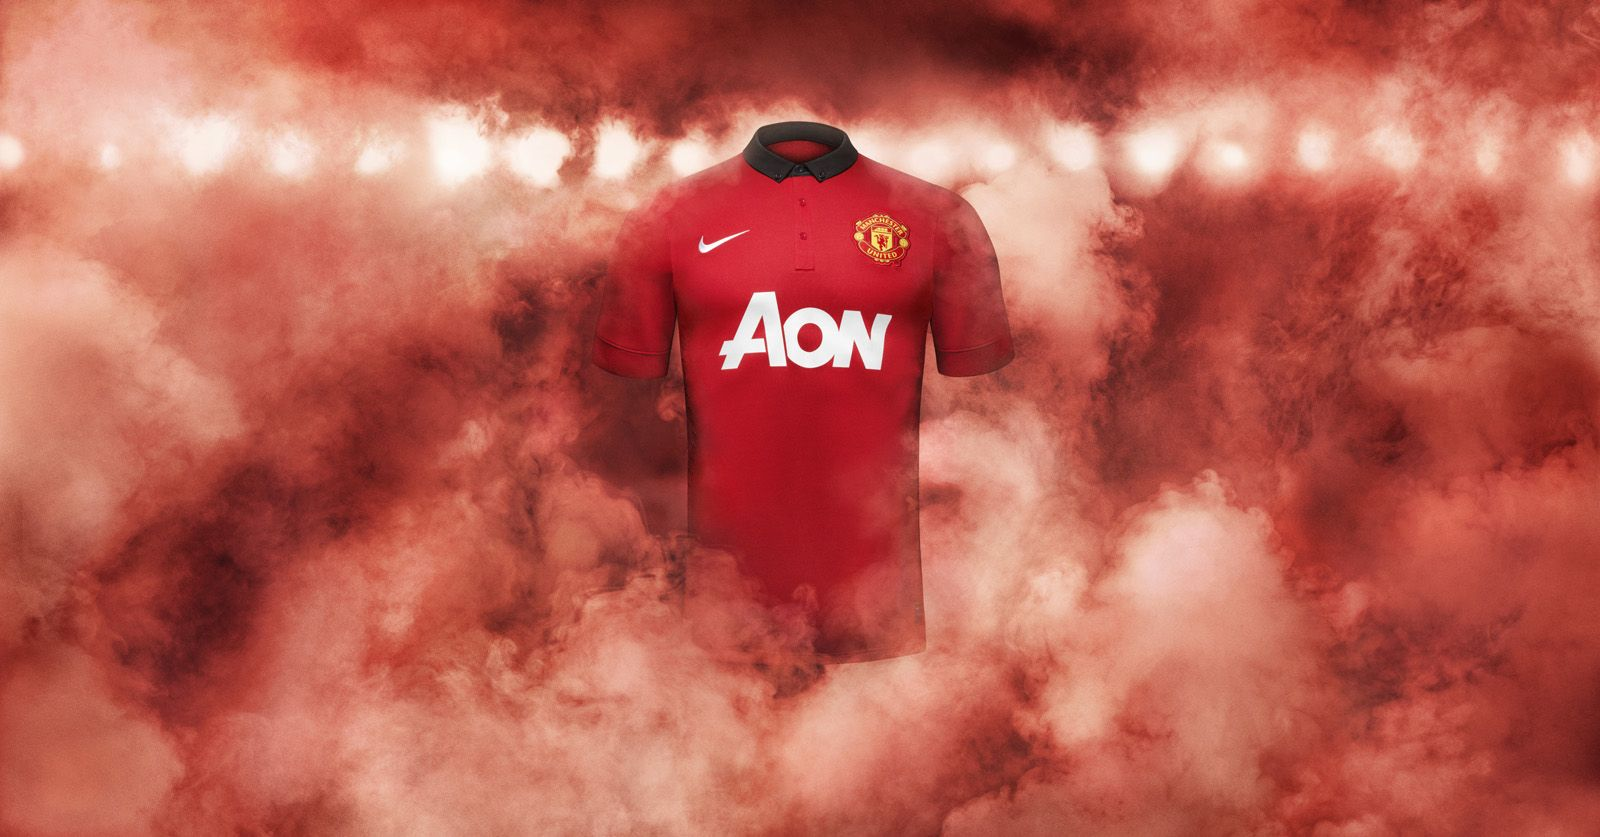 Manchester United 13 14 Home Kit 1 Jpeg 1600 837